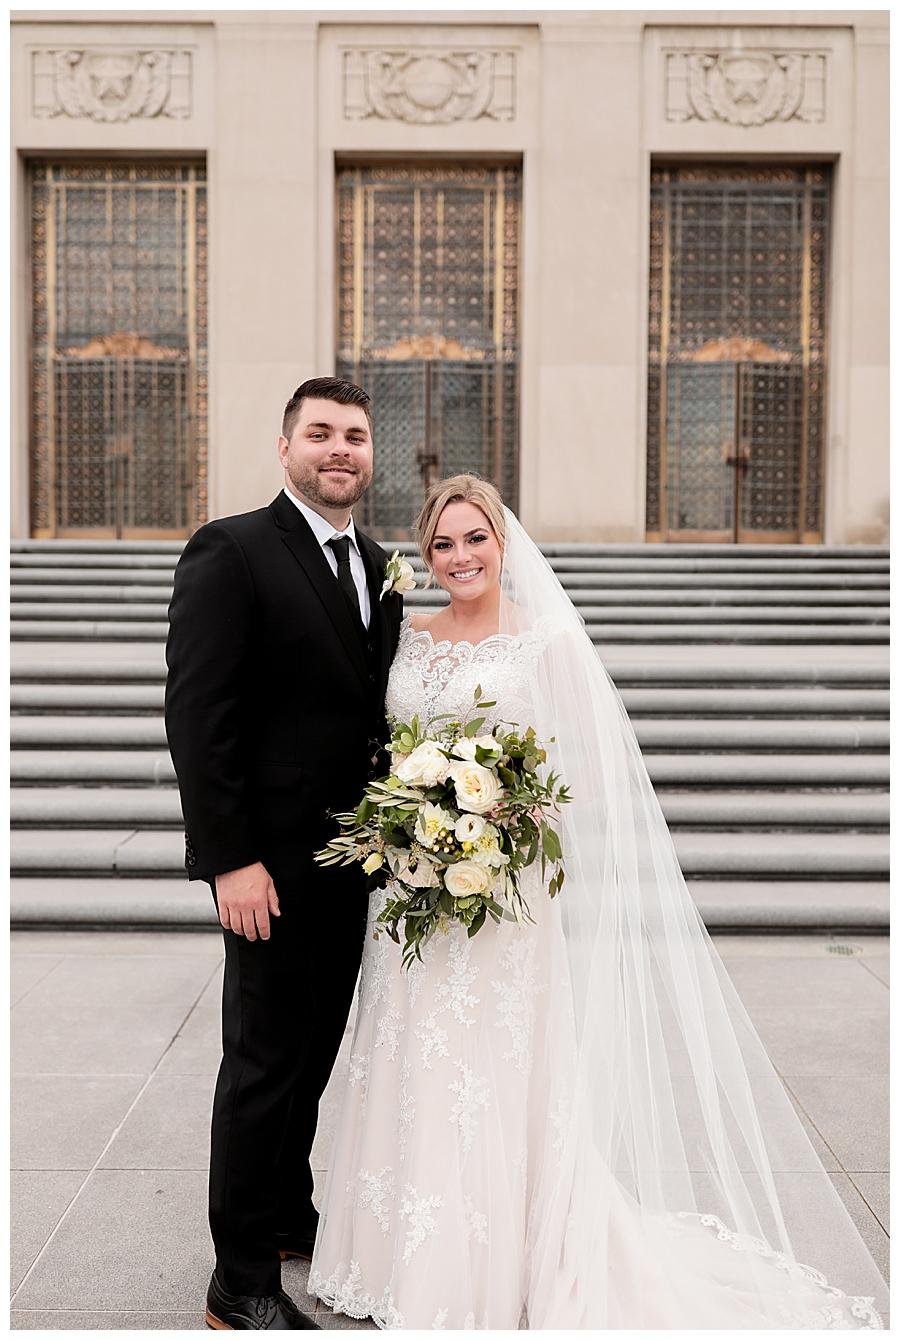 Indianapolis-Indiana-Wedding-Photography-Meghan-Harrison_0405.jpg